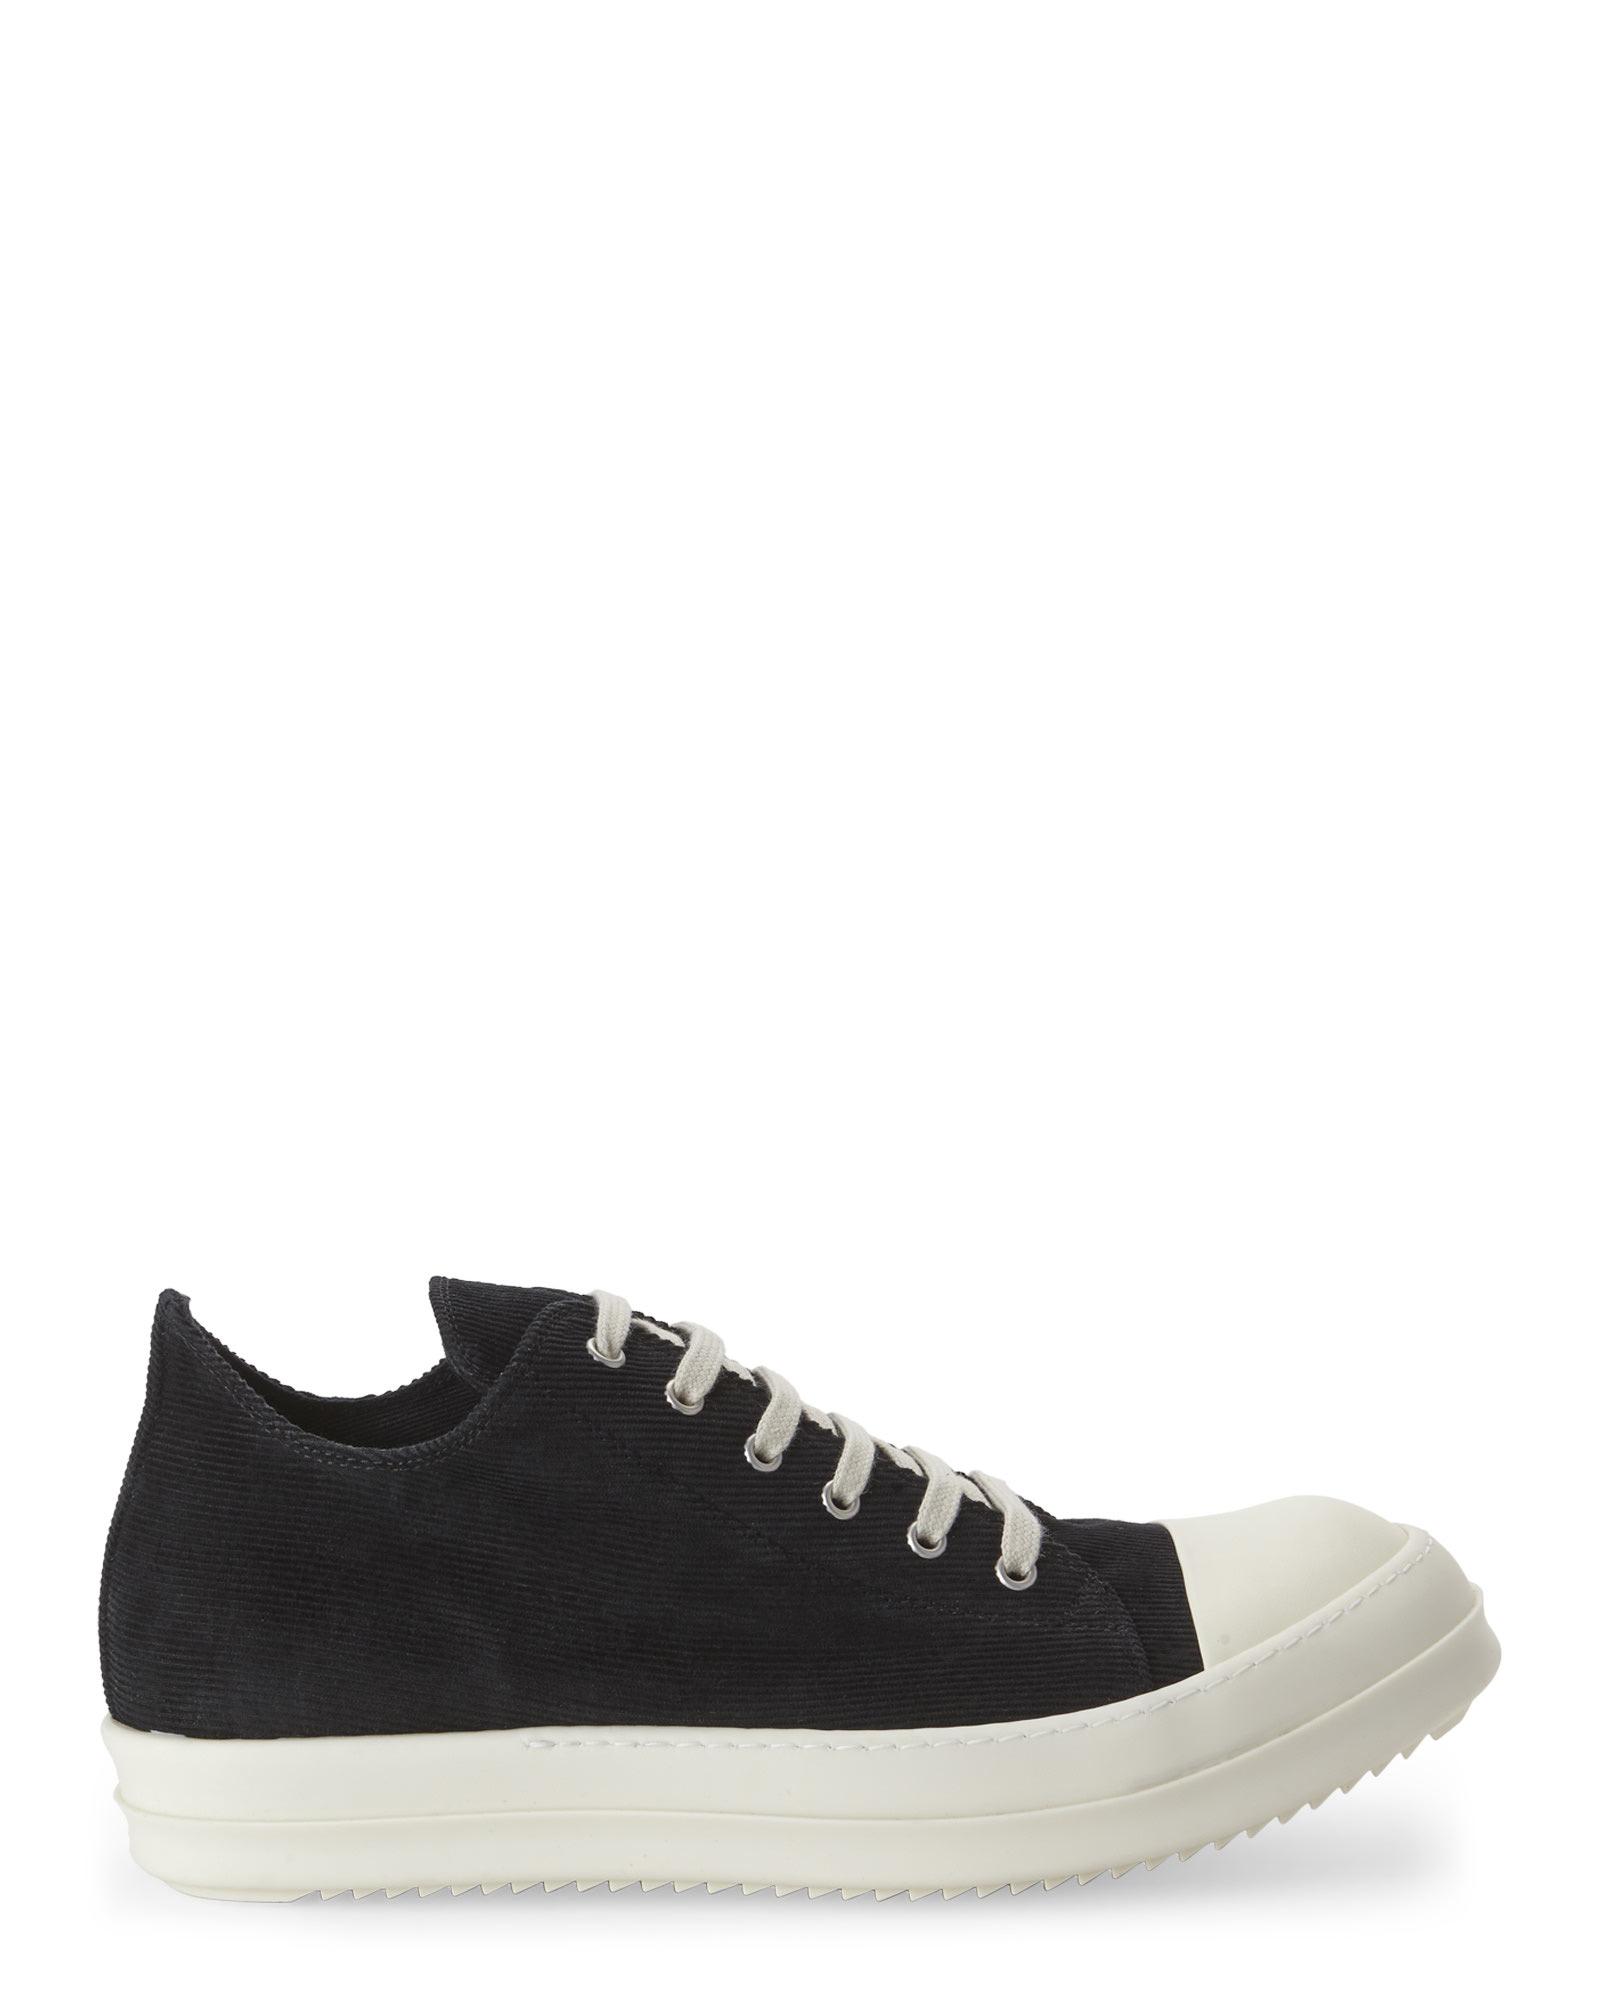 Rick Owens Drkshdw Grey & Off-White Low Sneakers MAUhibU